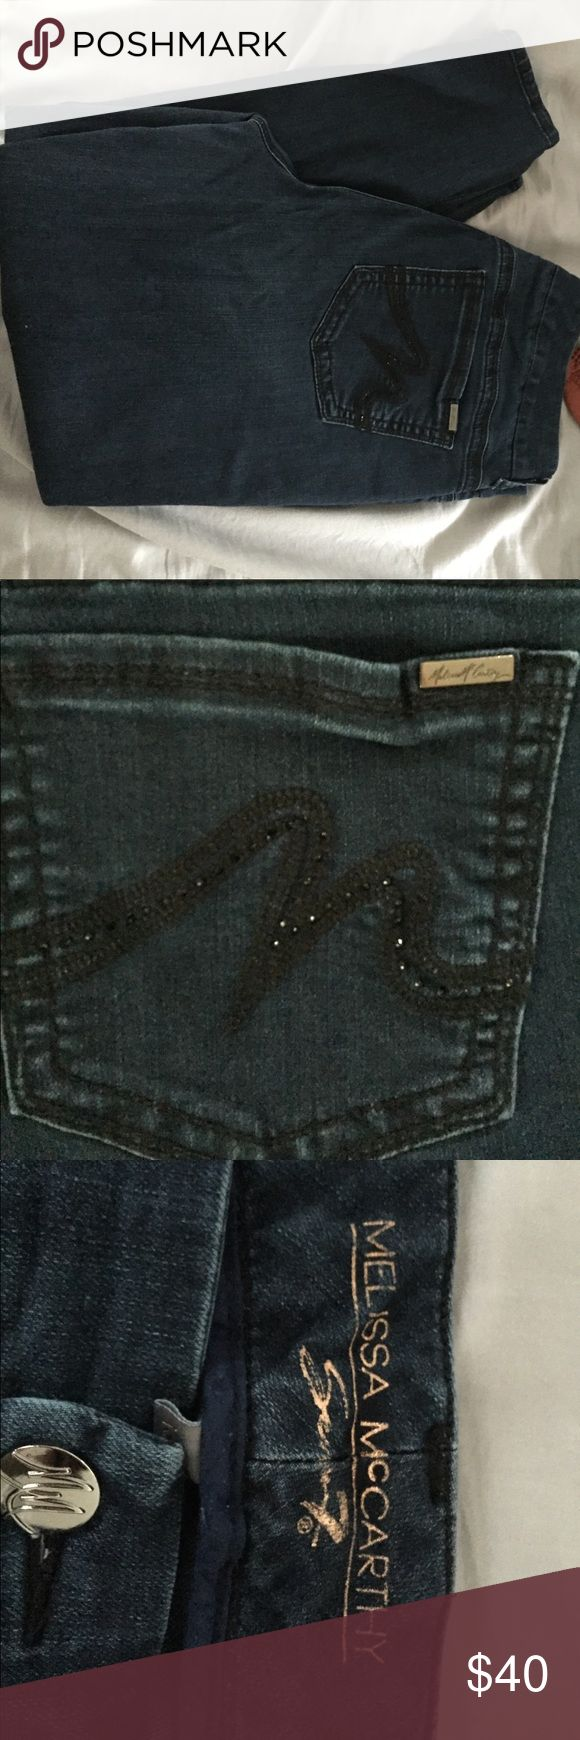 Seven Melissa McCarthy plus size skinny jeans Size 18. Worn once Melissa McCarthy Seven7 Jeans Skinny